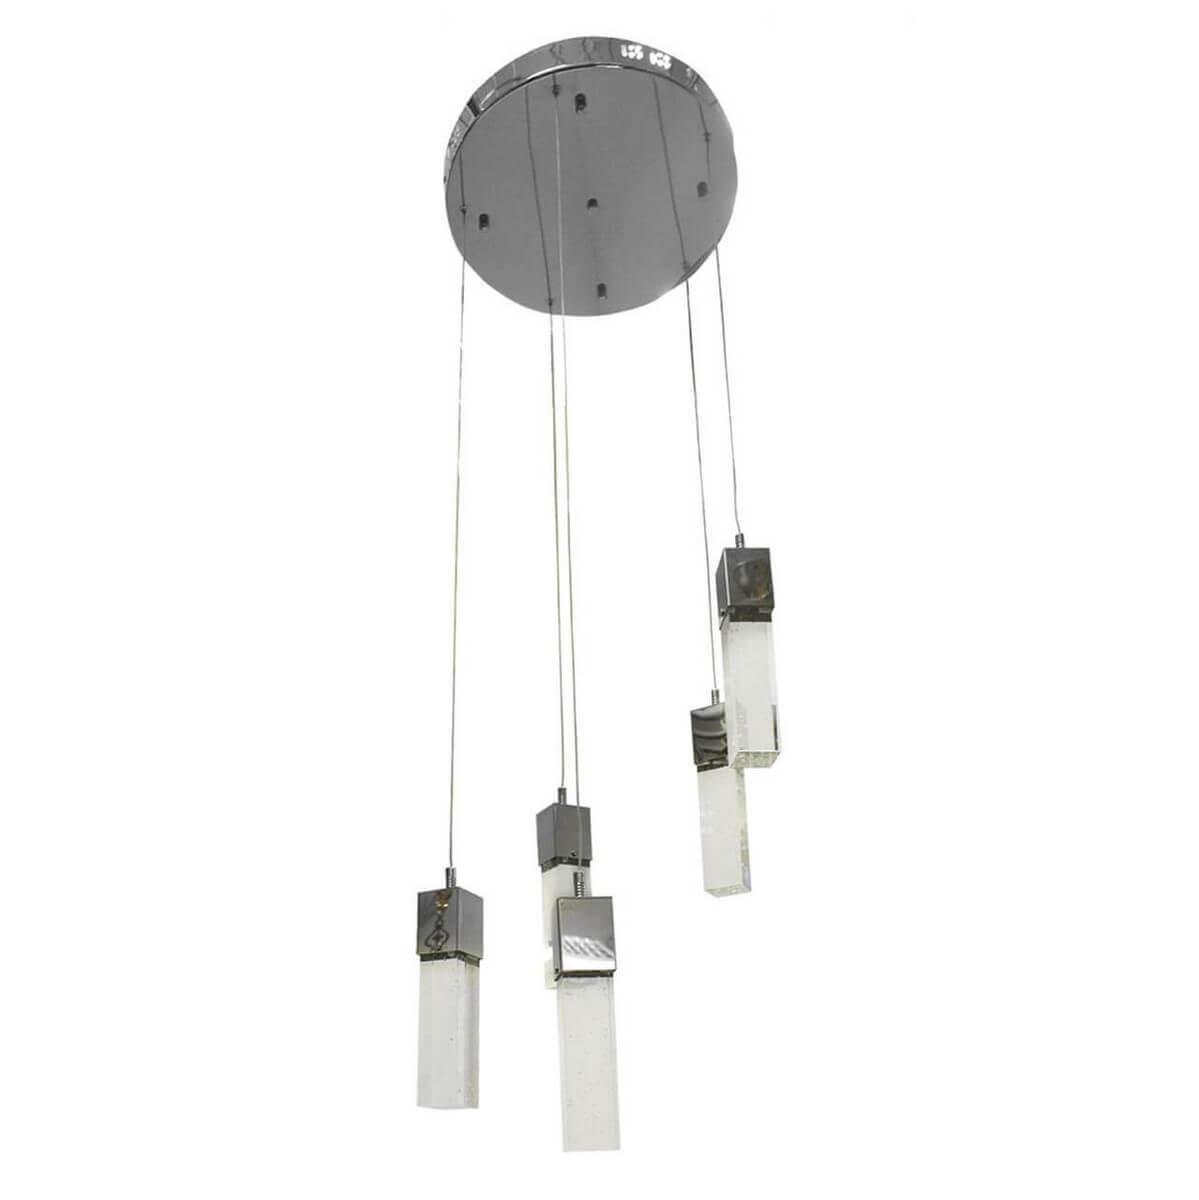 Люстра Kink Light 08510-5A(4000К) Аква люстра kink light 08510 5a 4000к аква